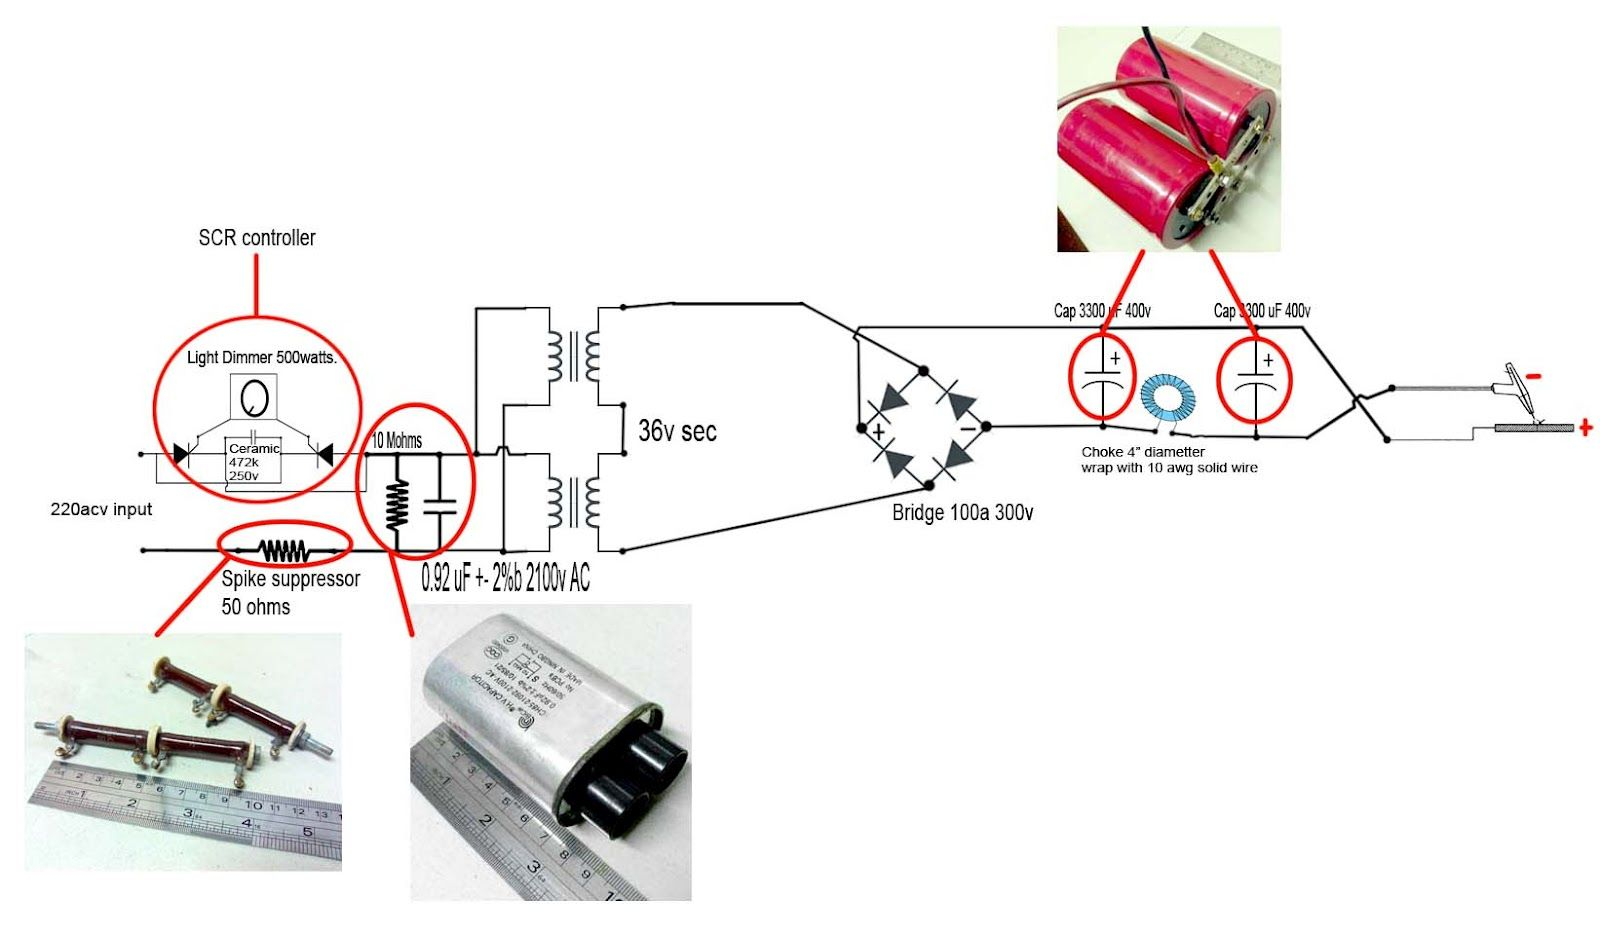 medium resolution of tig schematics and components st500f1200 30ee tig pinterest diy tig welder schematic diy get free image about wiring diagram